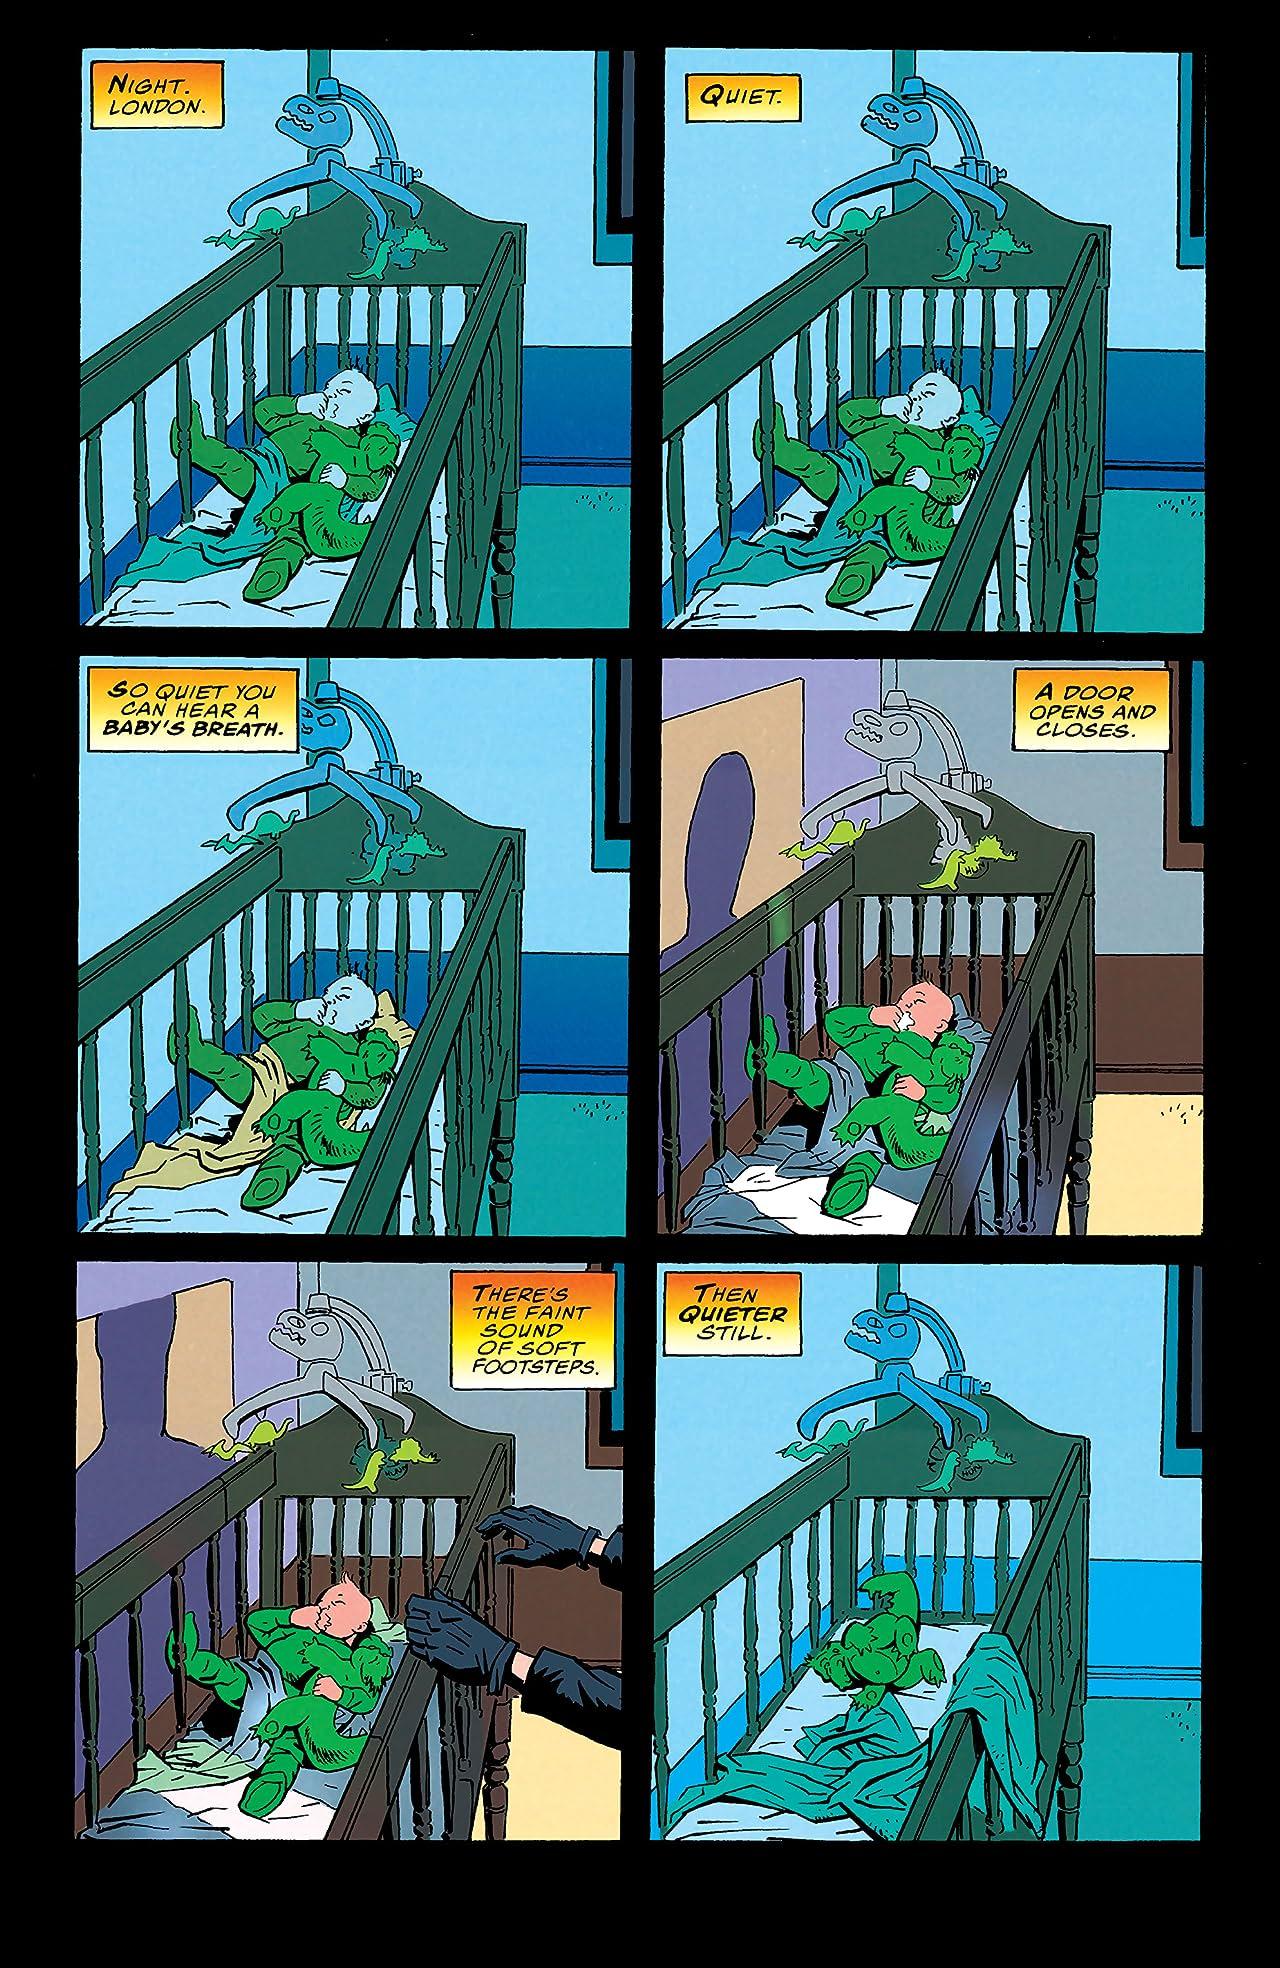 Starman: The Mist (1998) #1